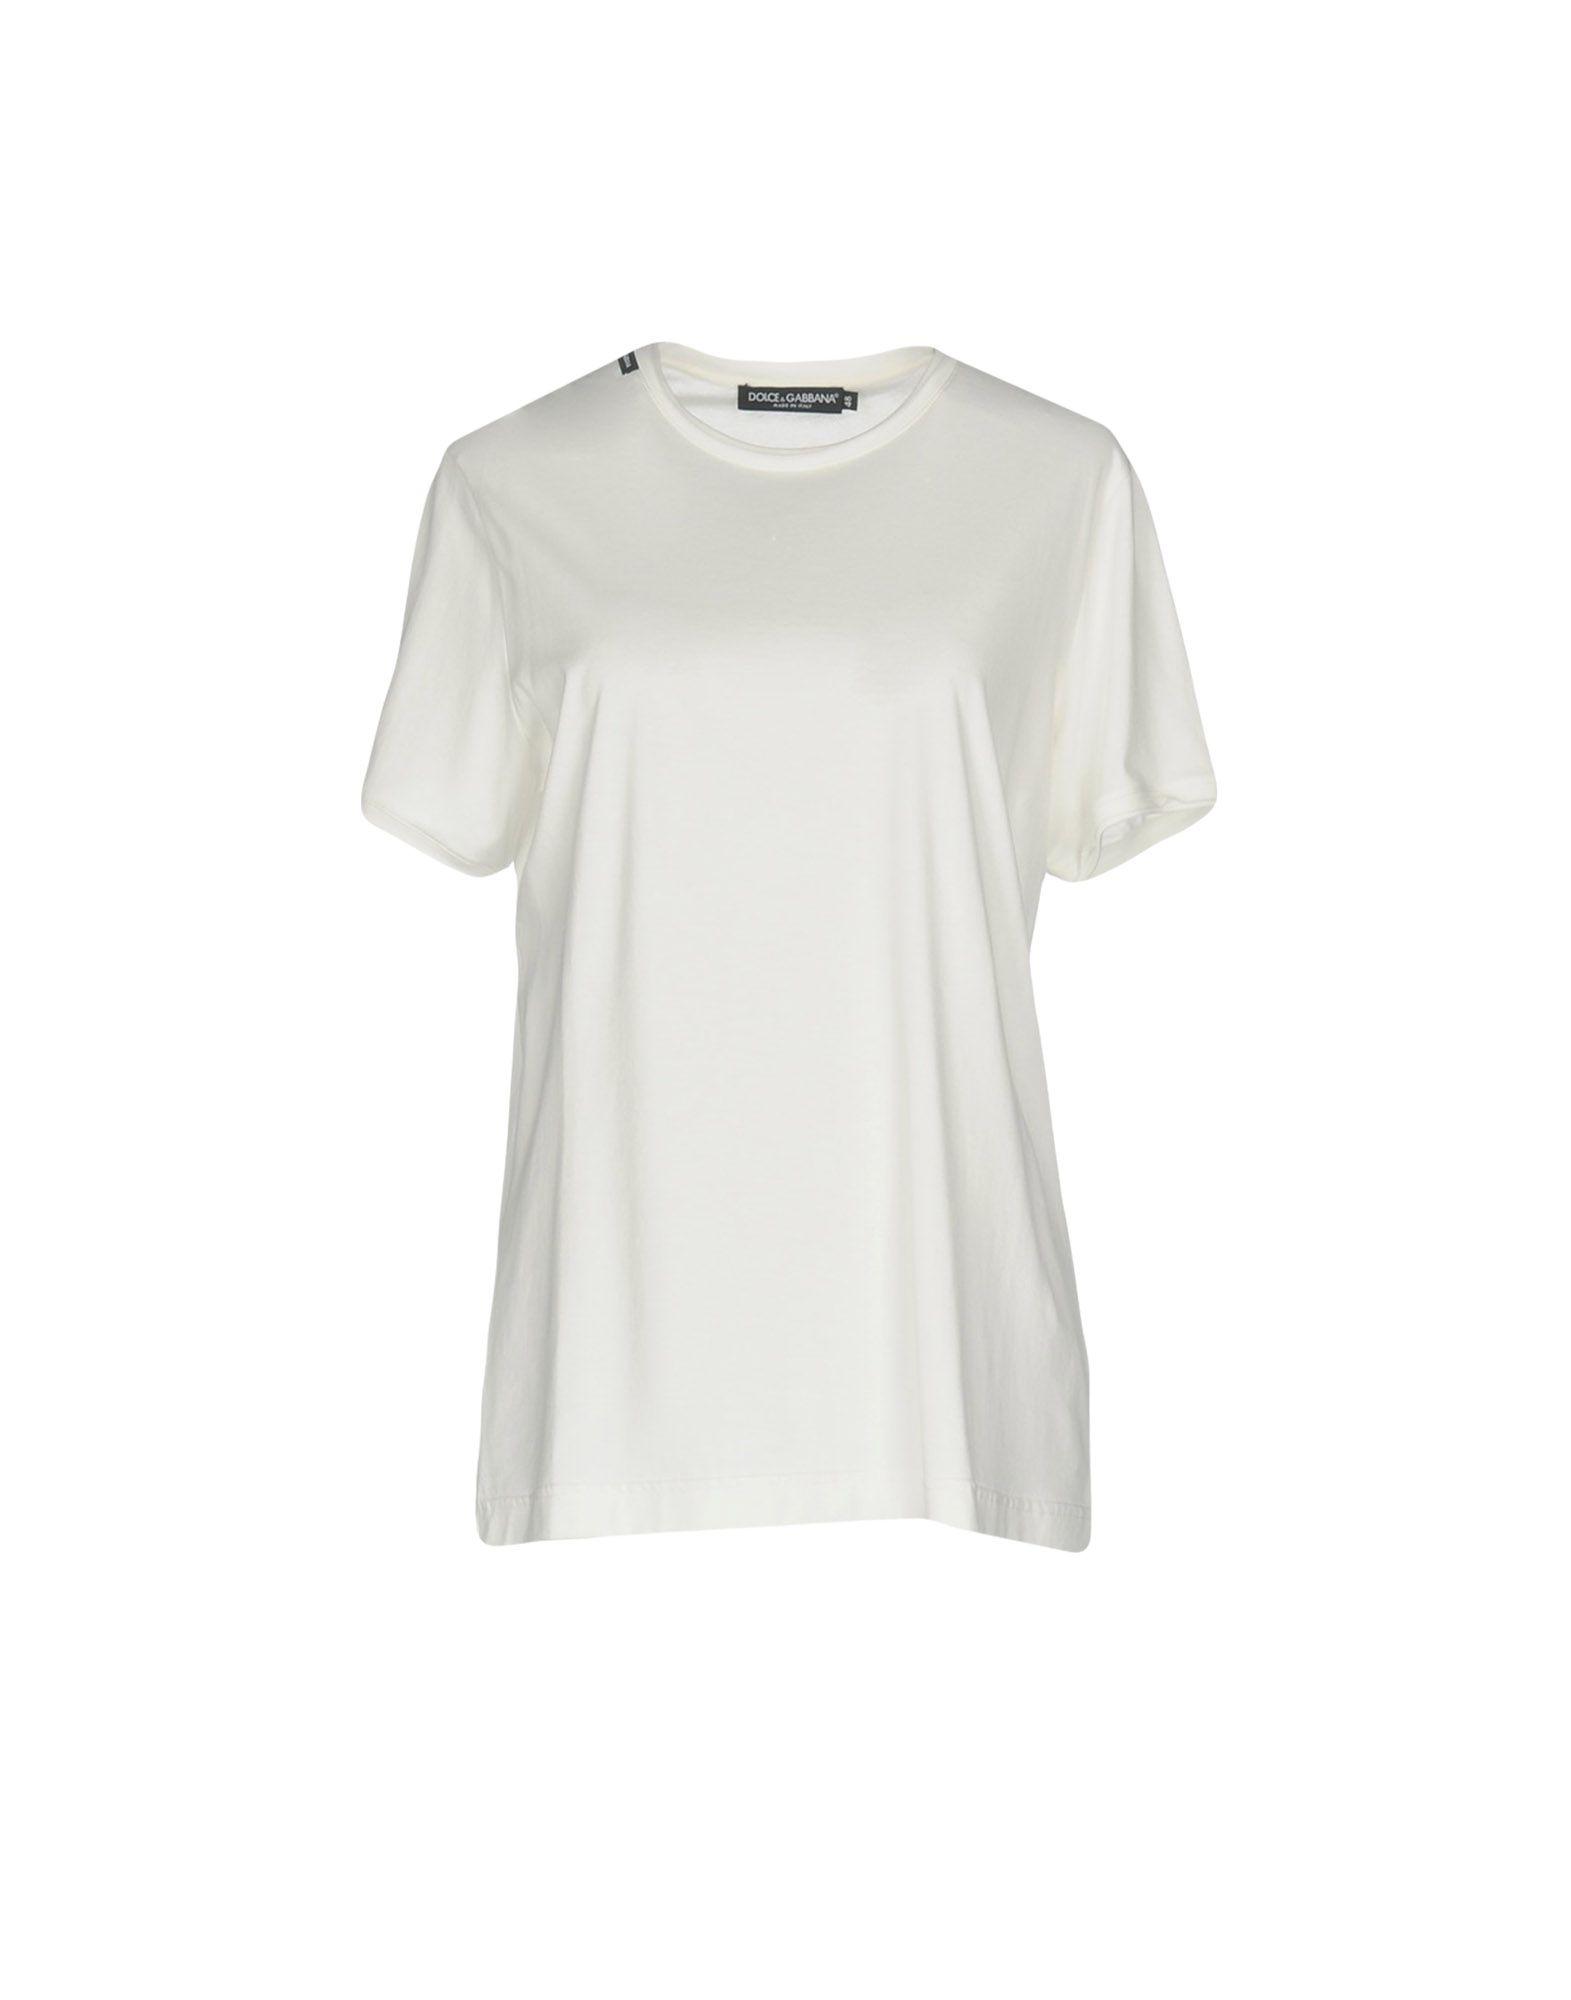 футболка мужская dolce DOLCE & GABBANA Футболка